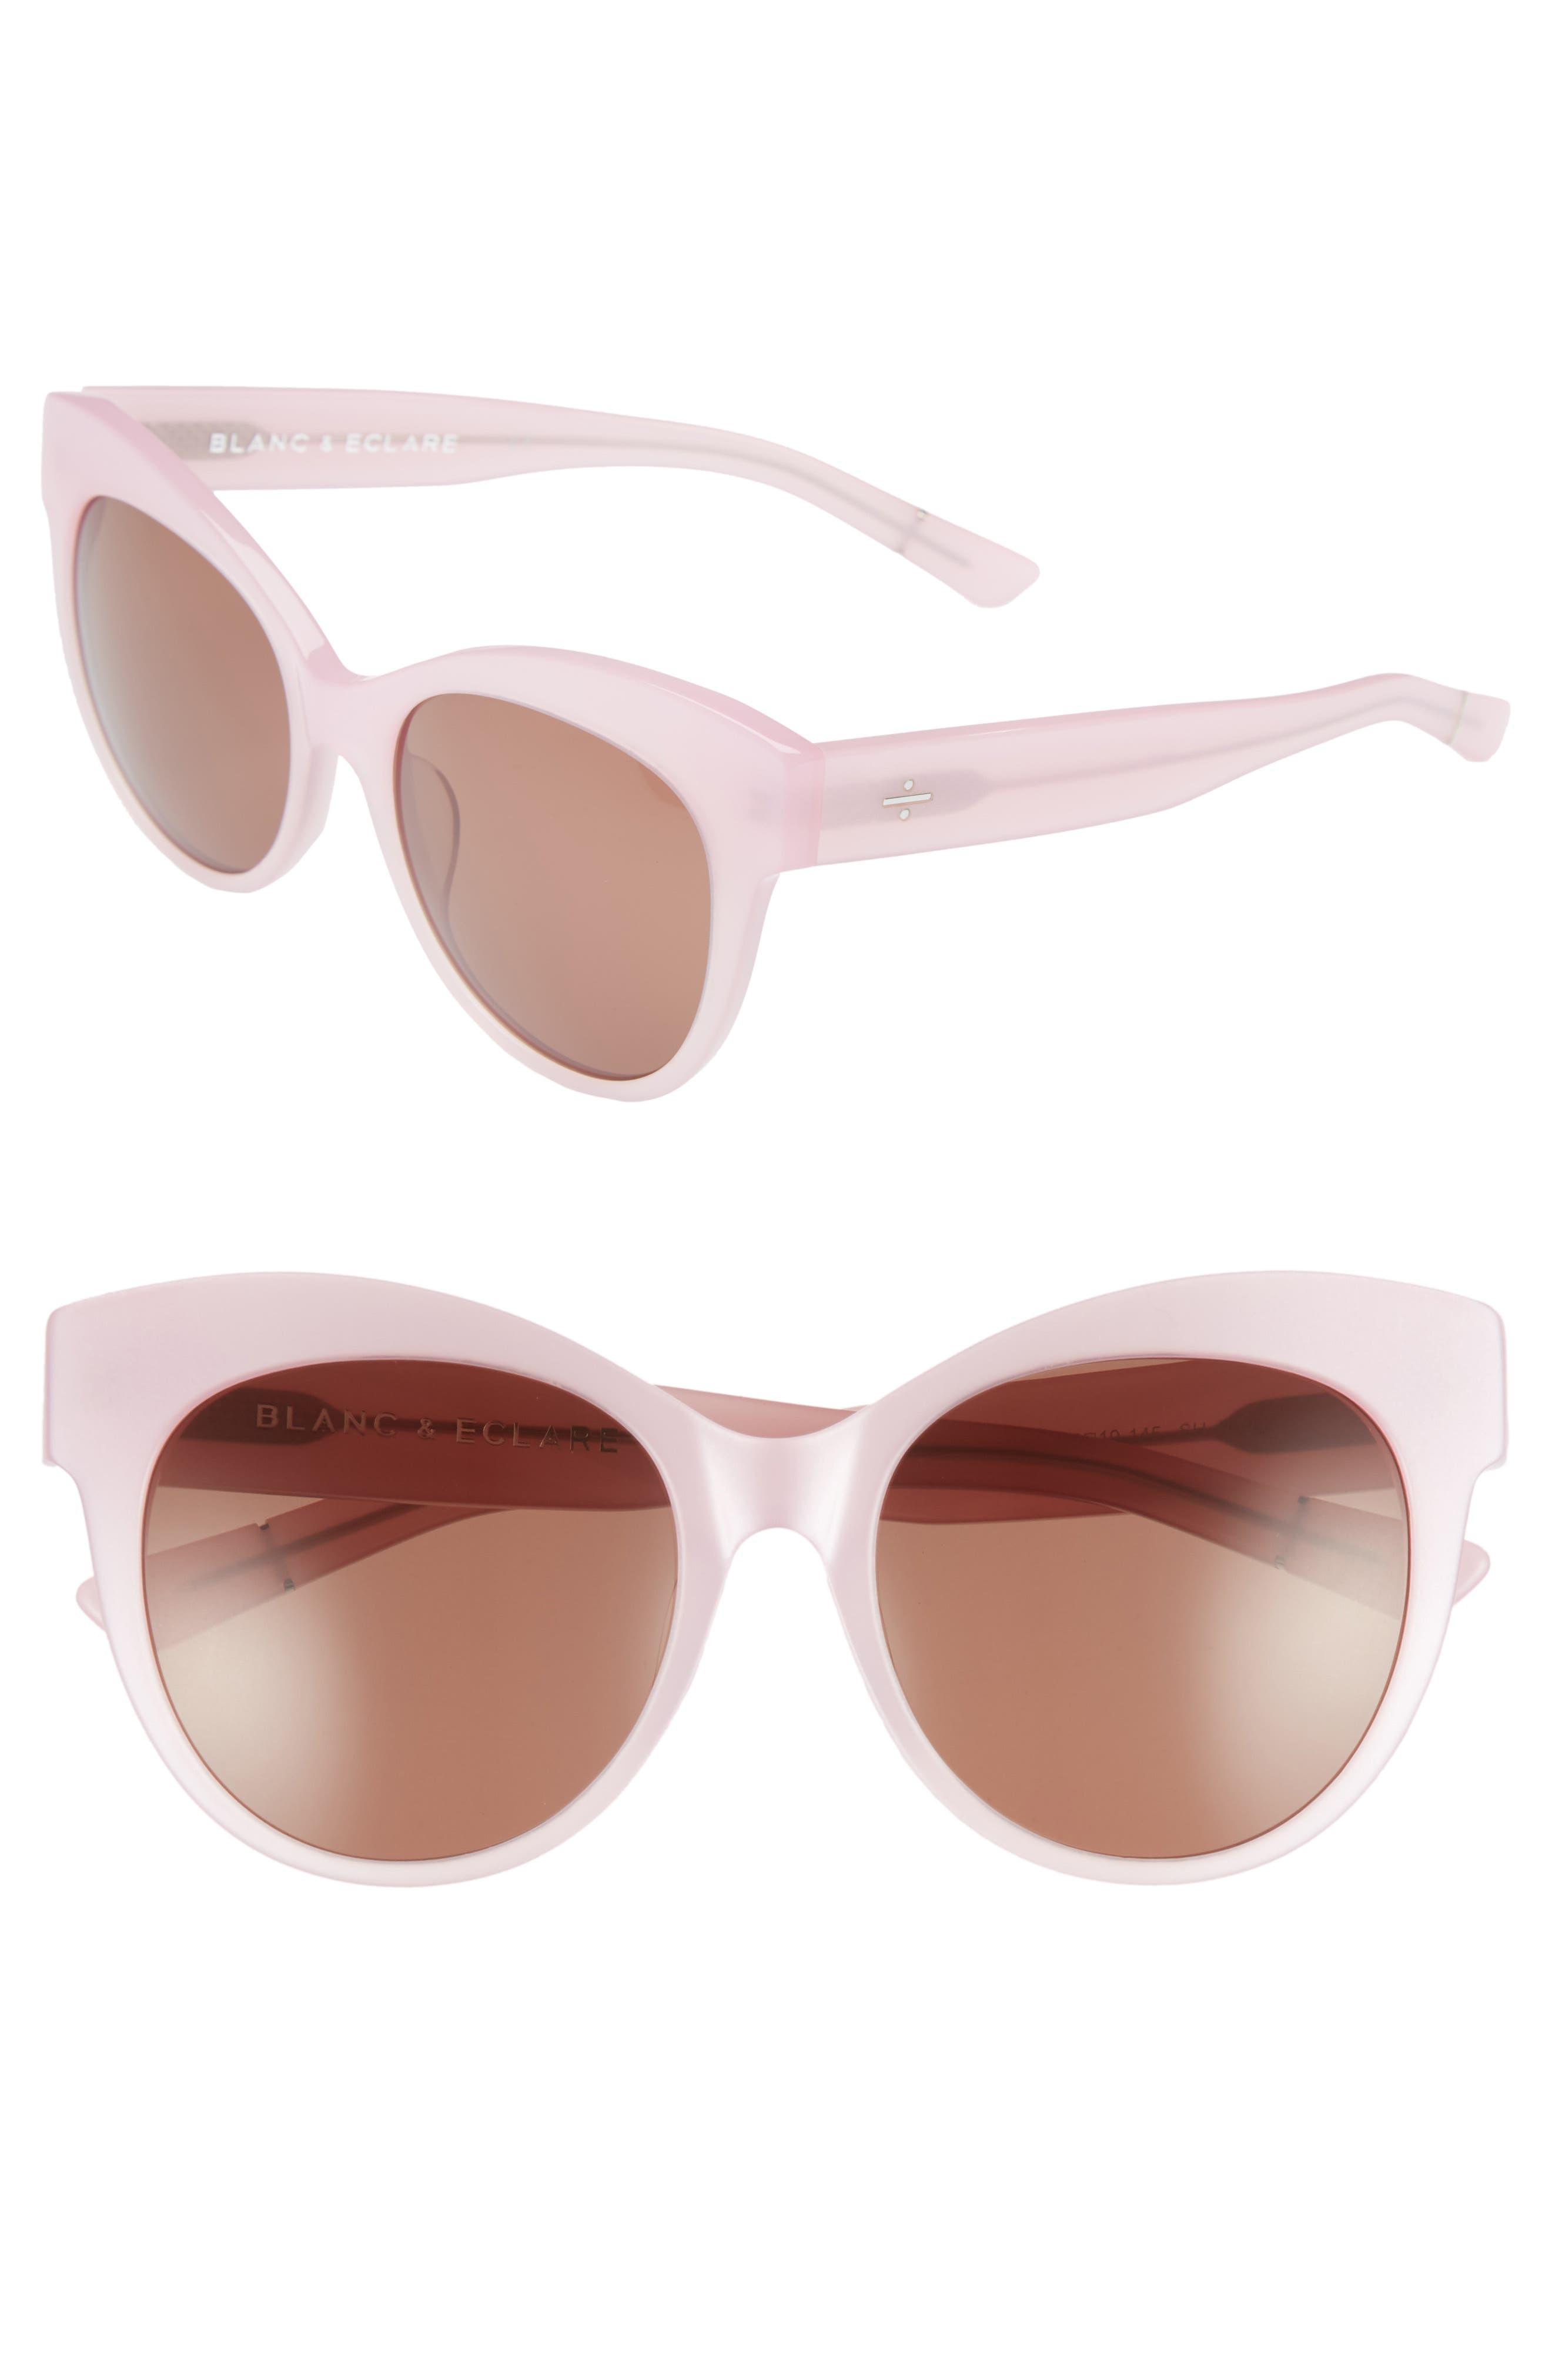 BLANC & ECLARE Paris 55mm Polarized Cat Eye Sunglasses